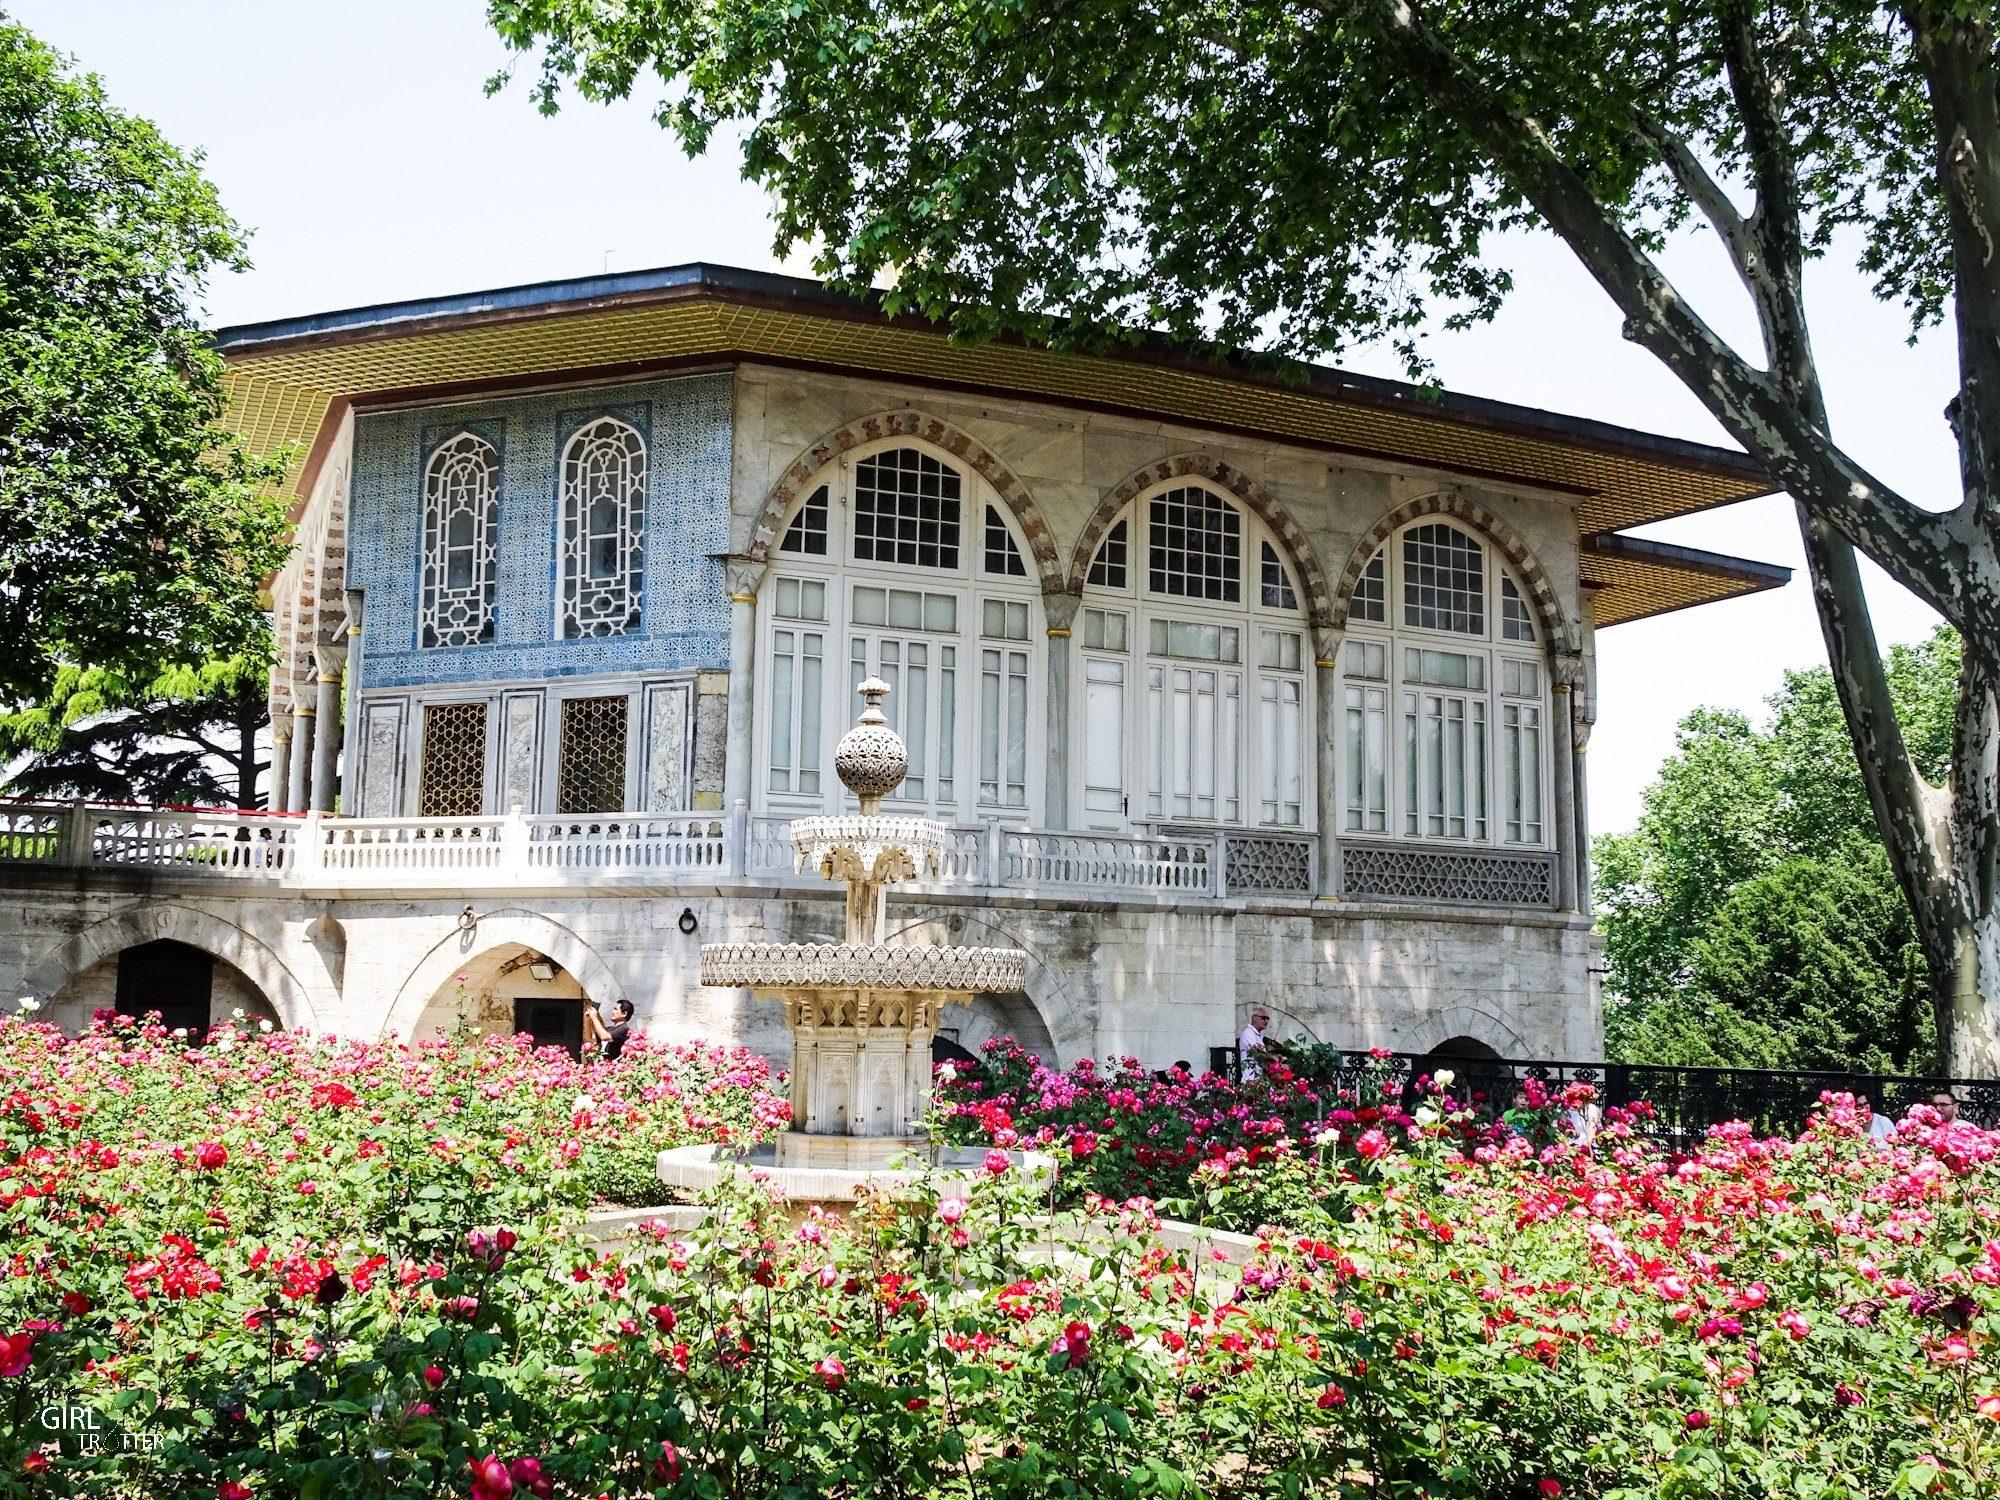 Kiosque d'Erevean au Palais de Topkapi